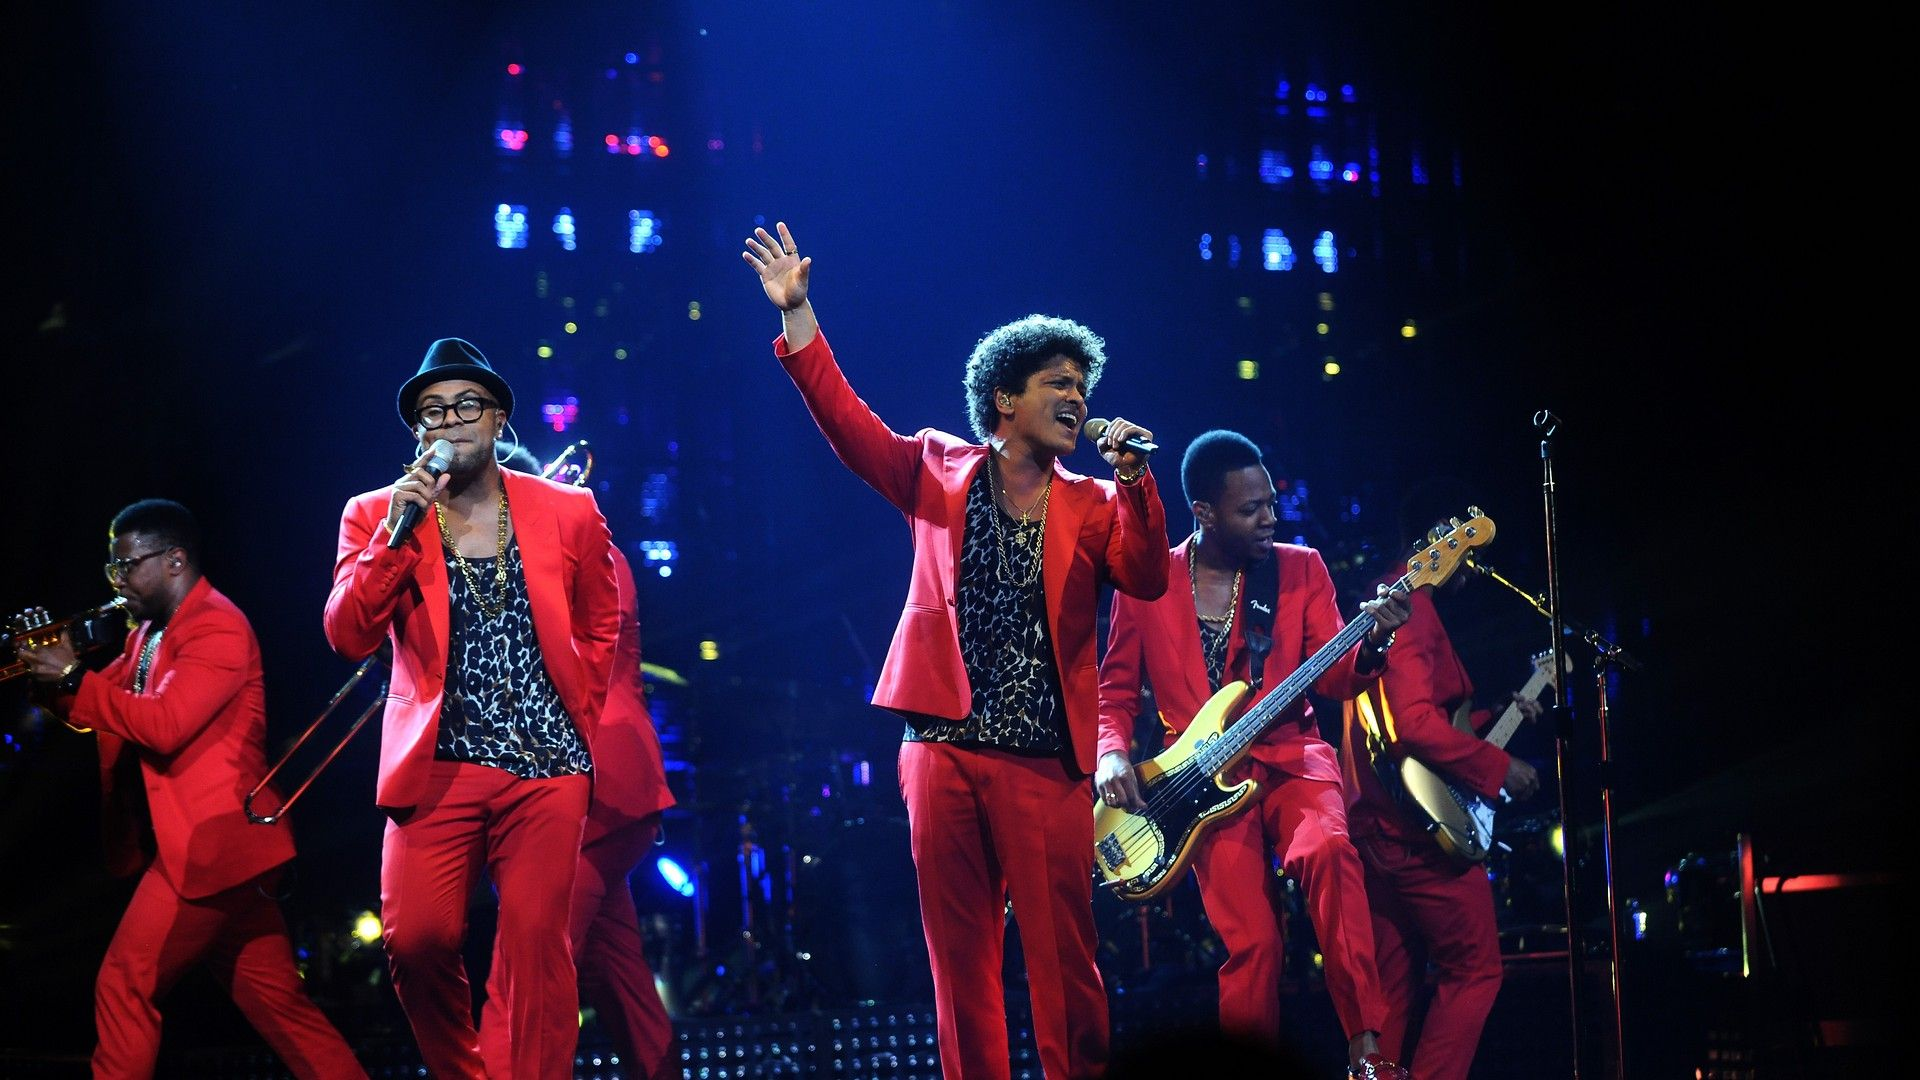 HD Bruno Mars Concert Wallpaper